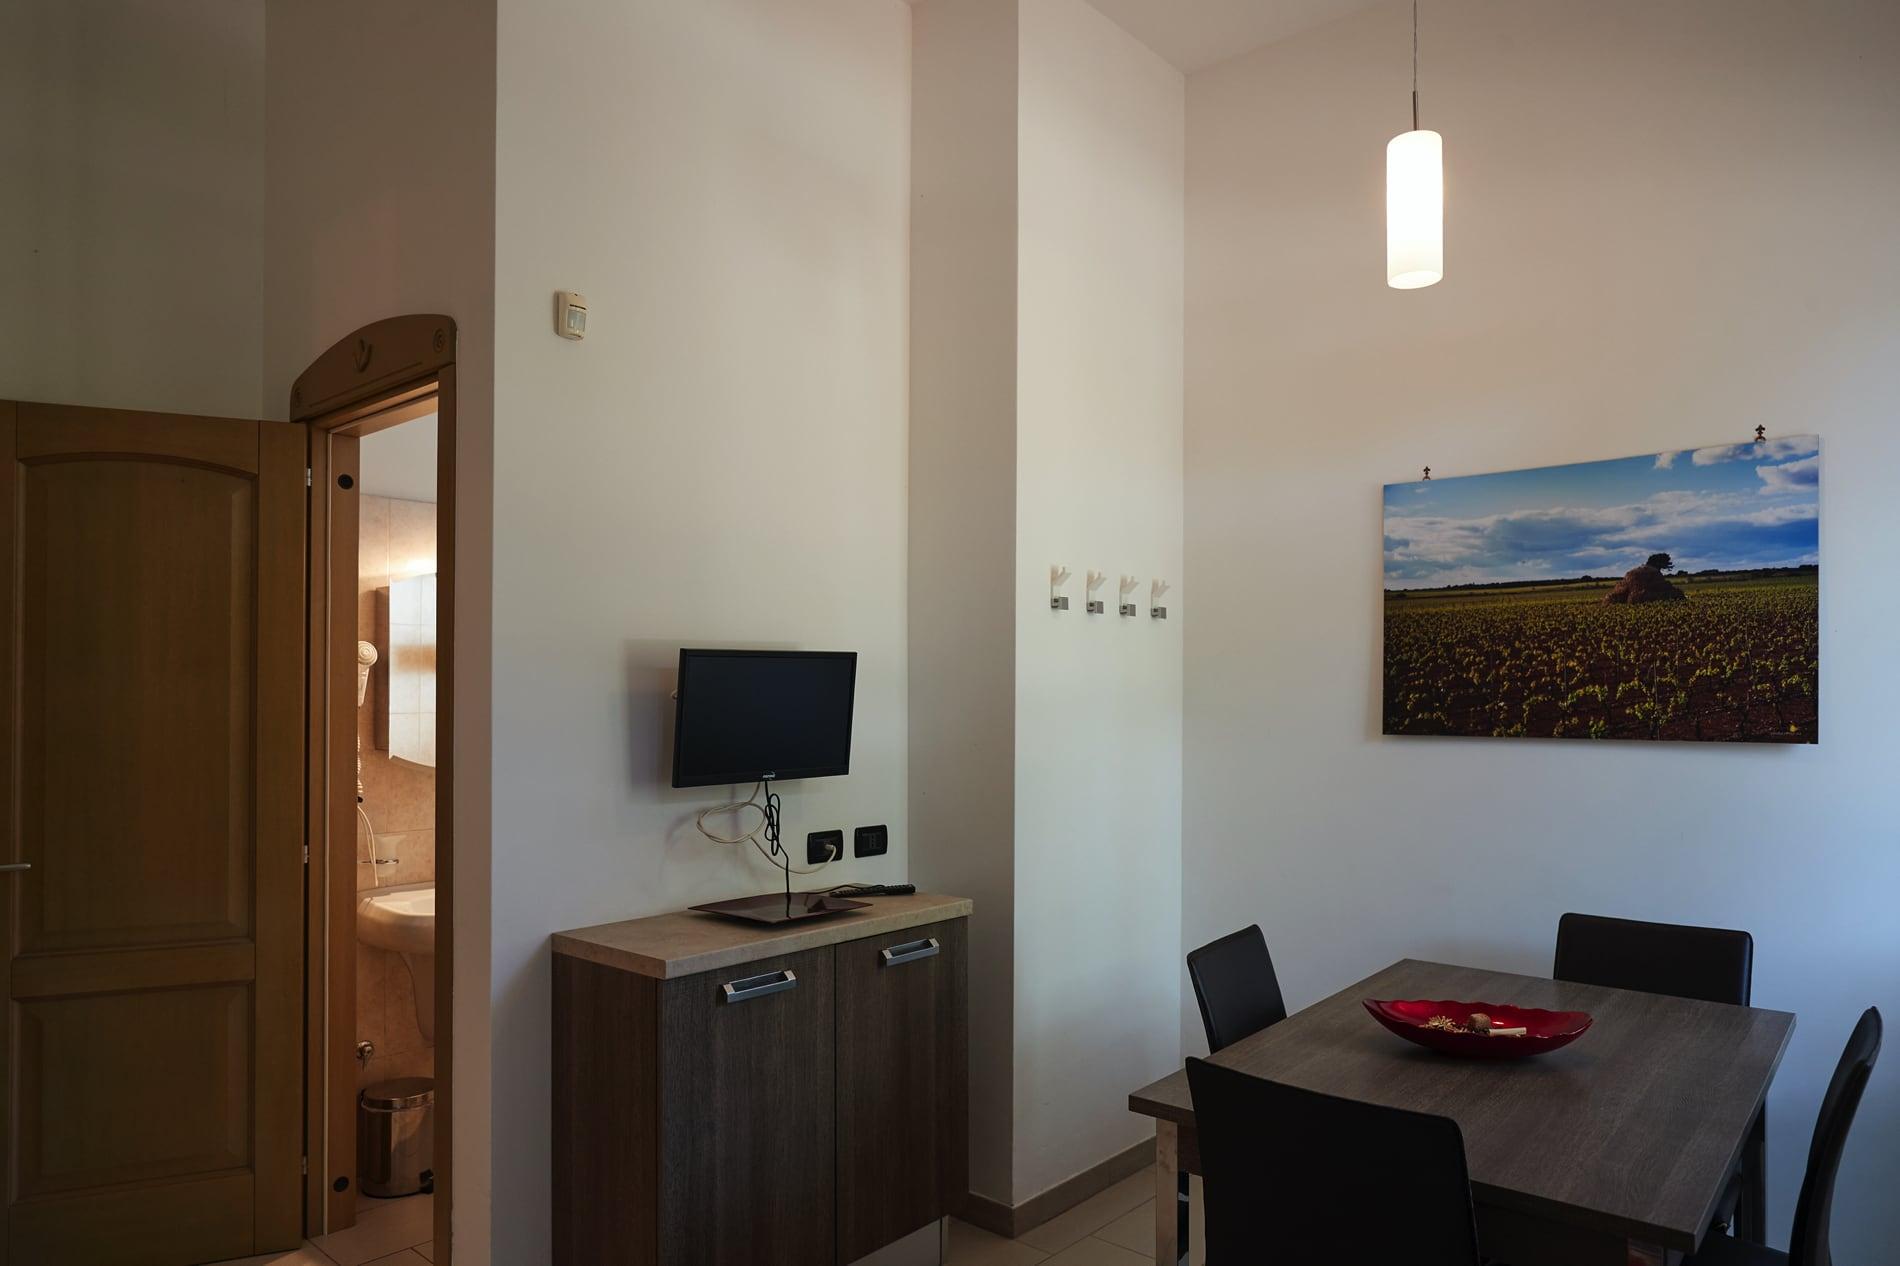 appartamenti large8I3437